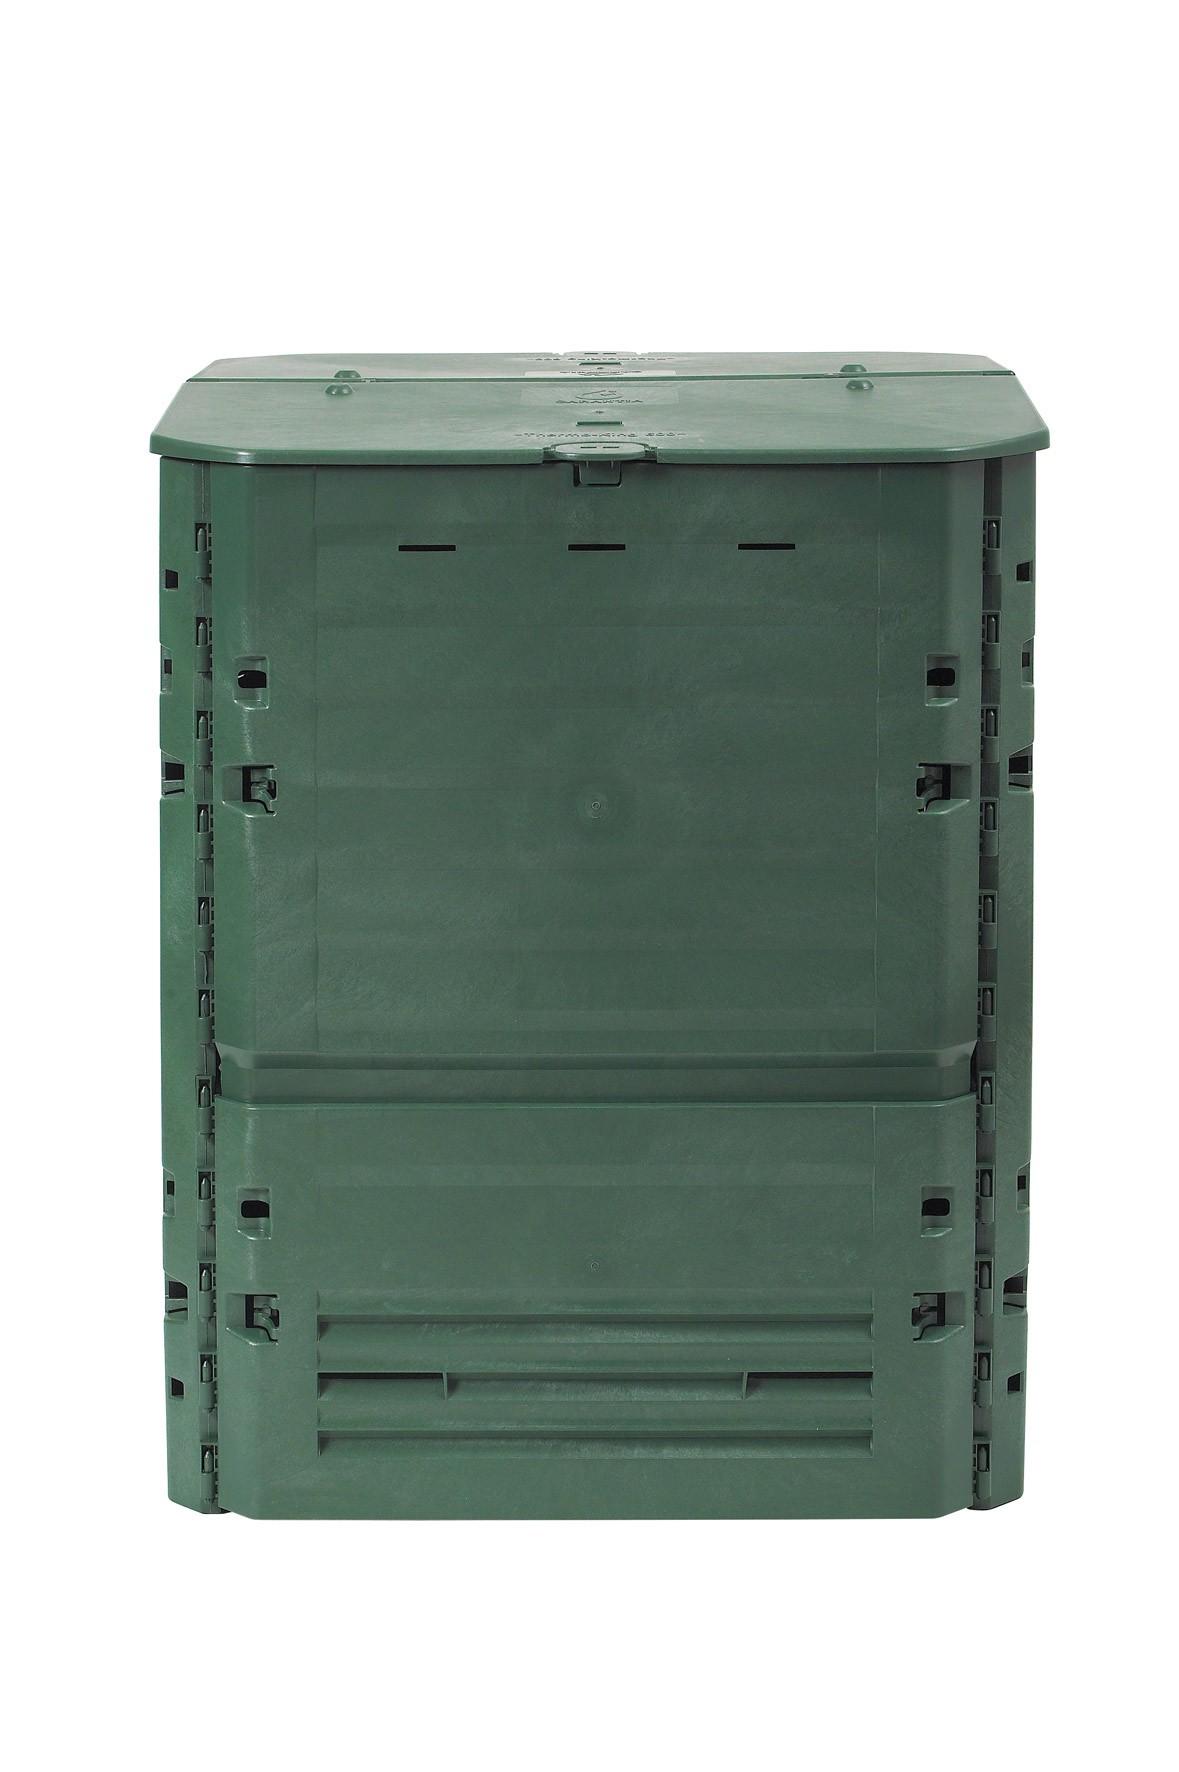 komposter thermokomposter thermo king gr n 600 liter garantia 626002 bei. Black Bedroom Furniture Sets. Home Design Ideas